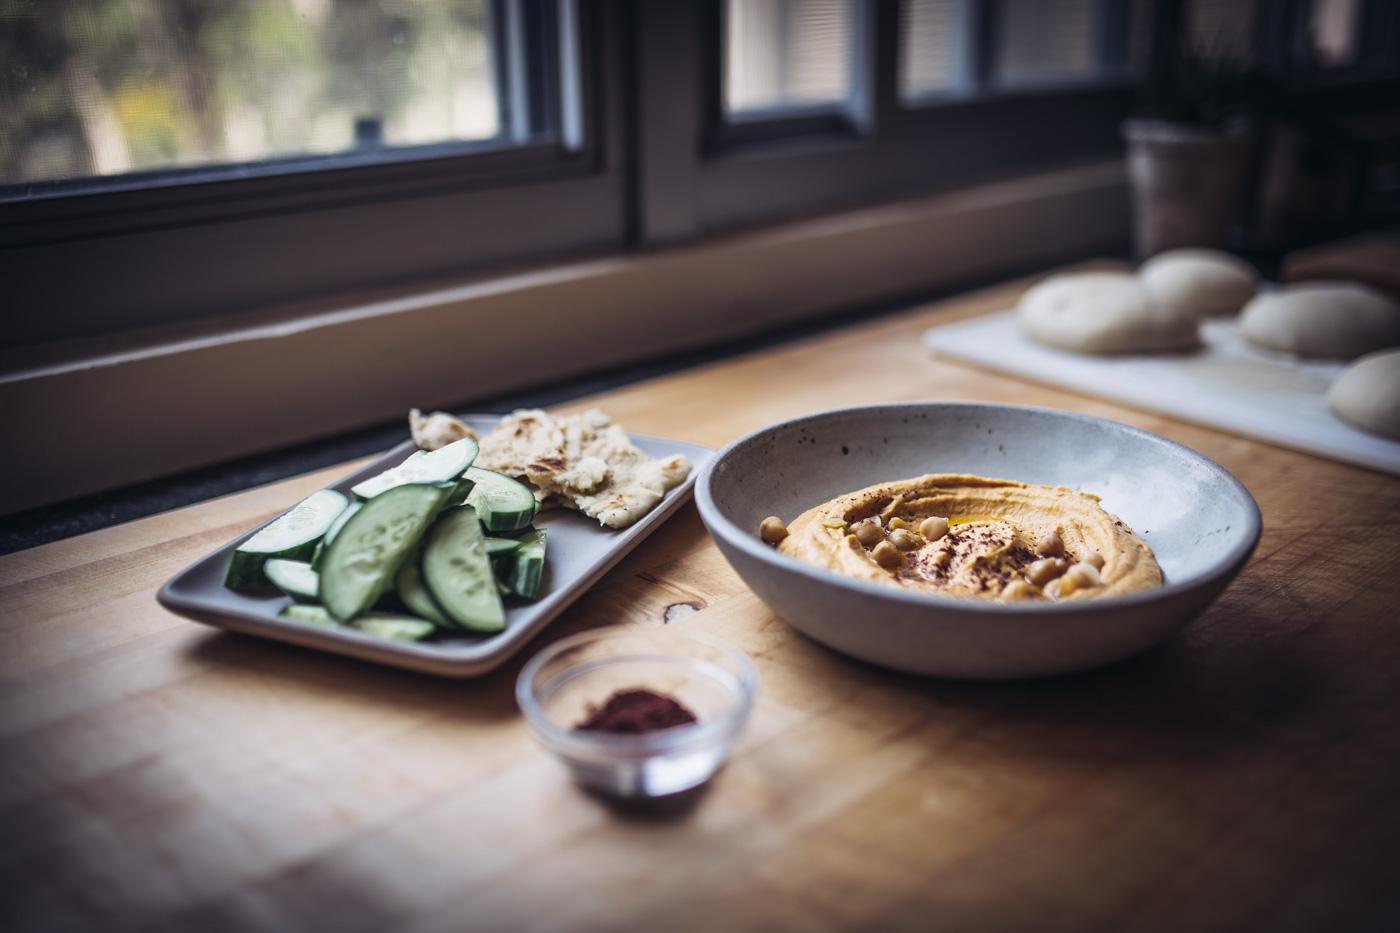 Sweet Potato Hummus with Garlic and Sumac Flatbread